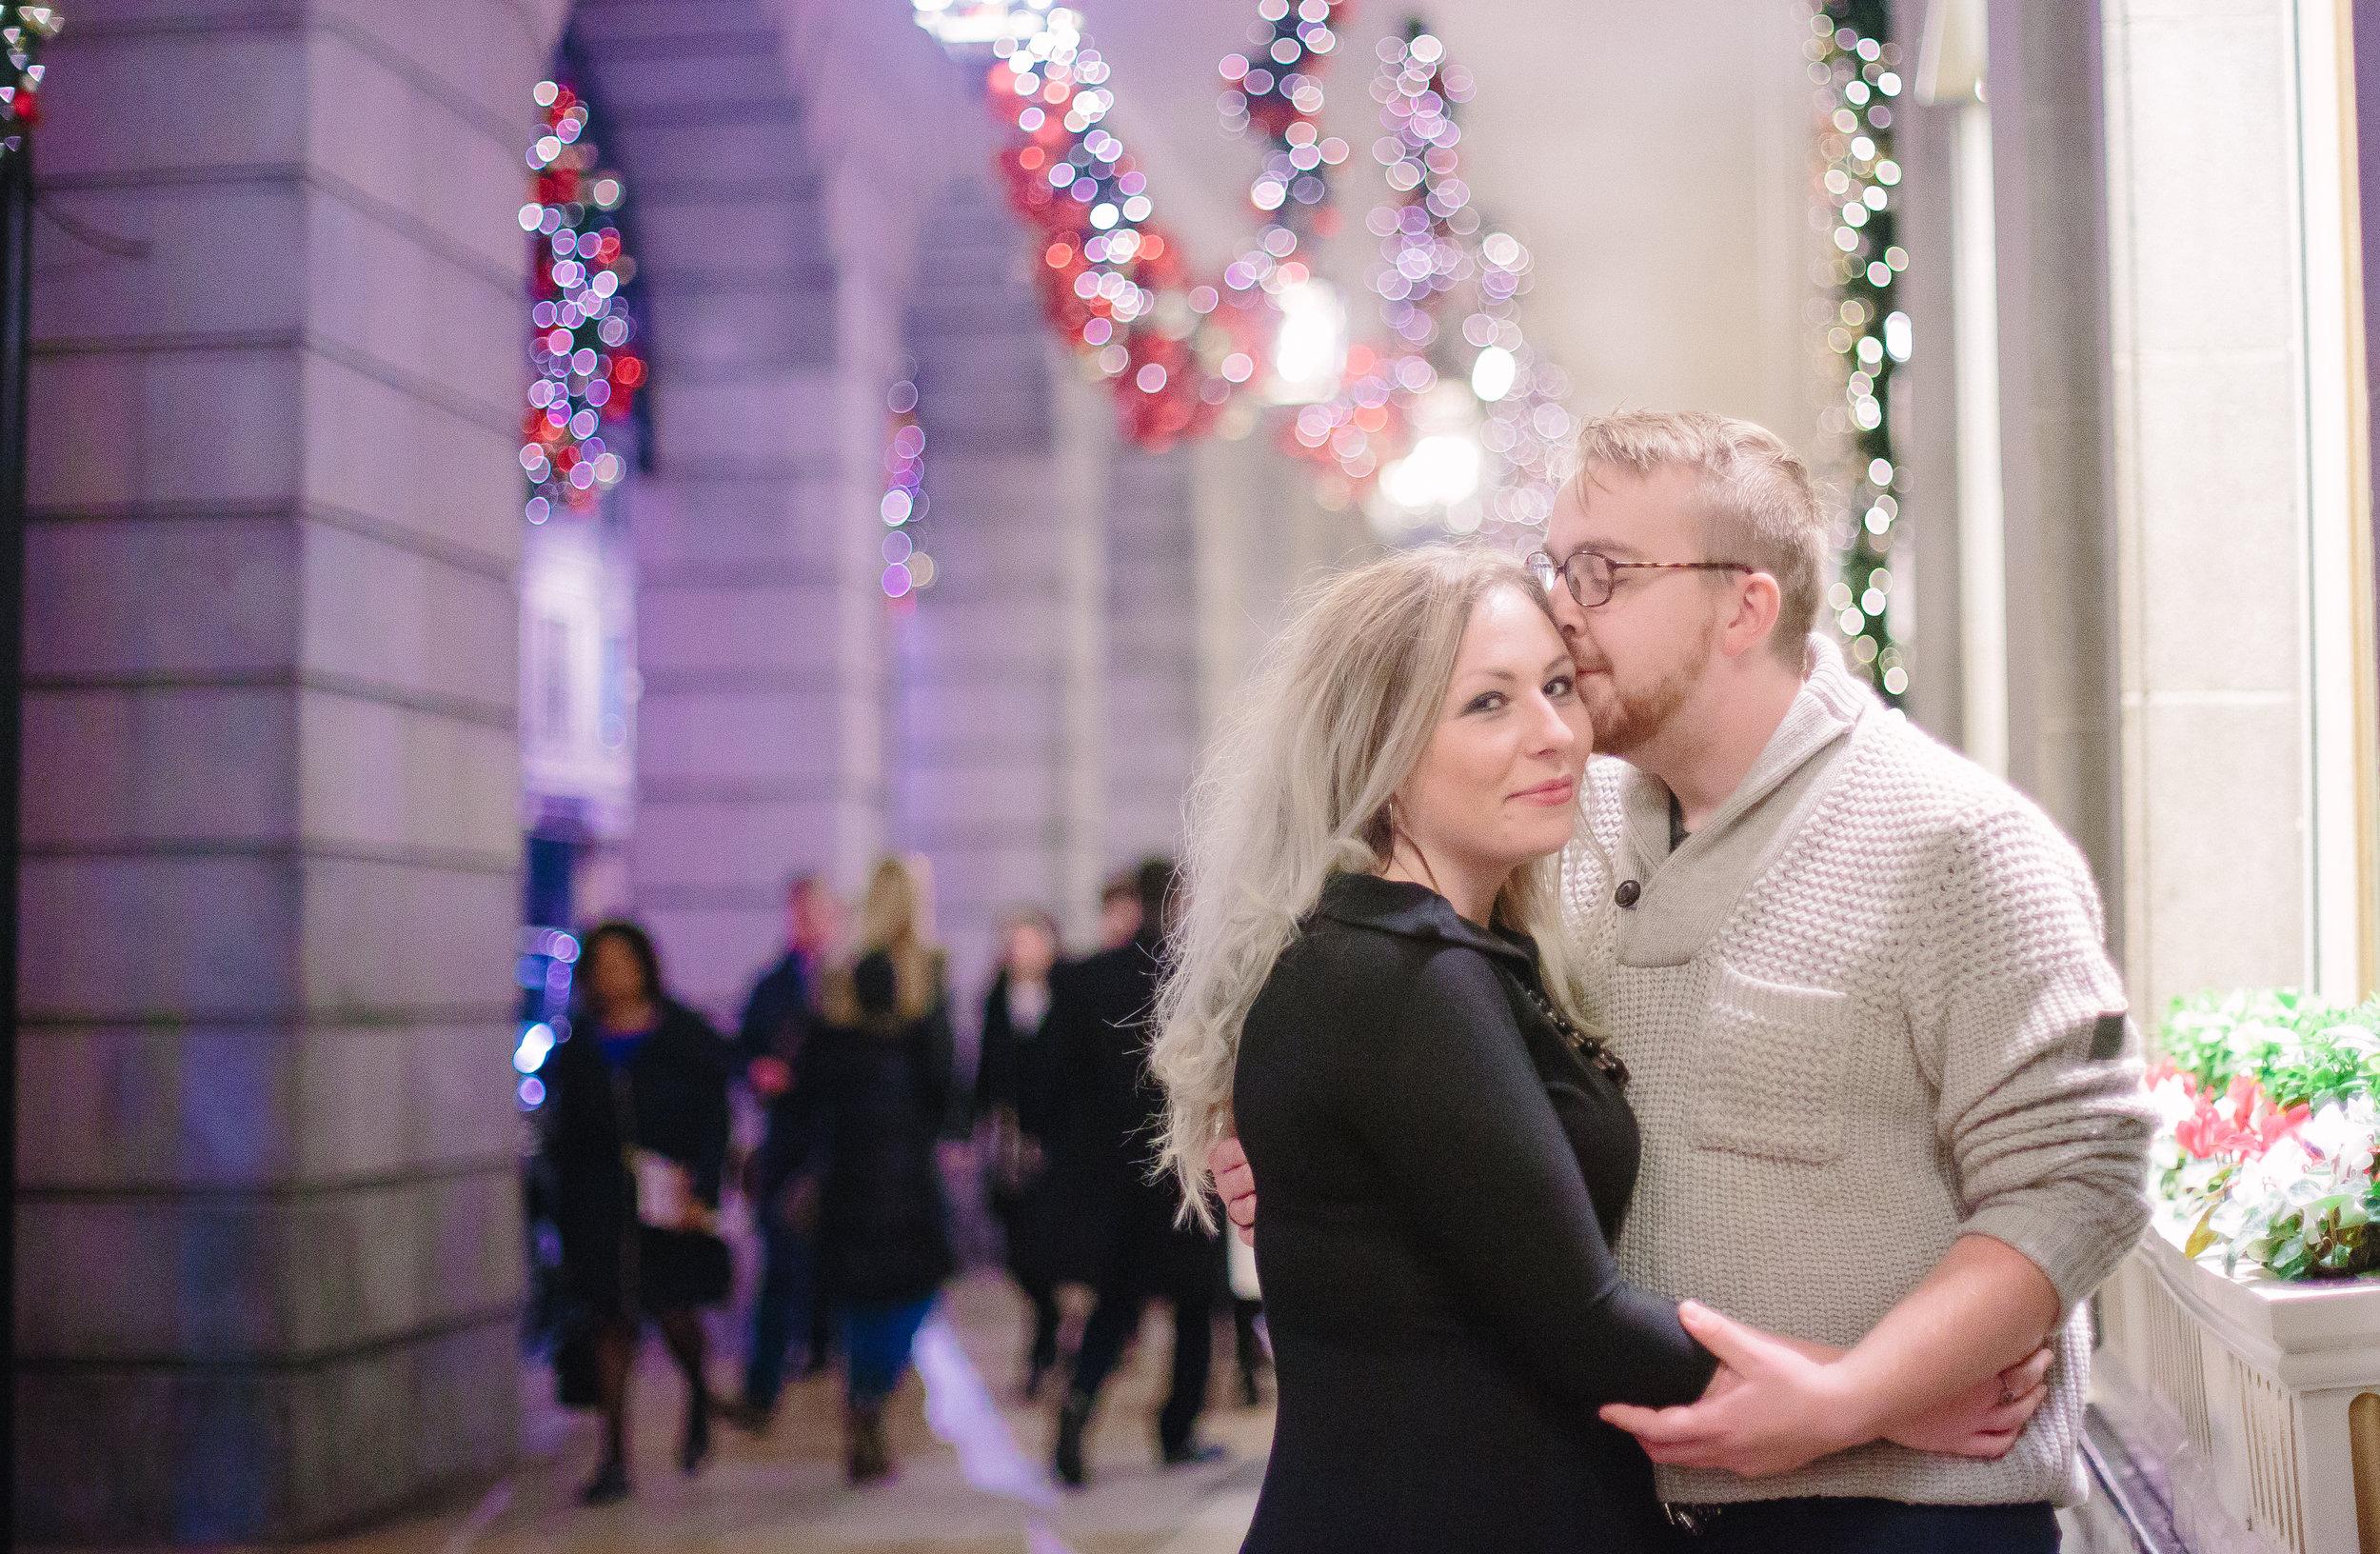 london-oxford-street-christmas-lights-engagement-wedding-photography-02